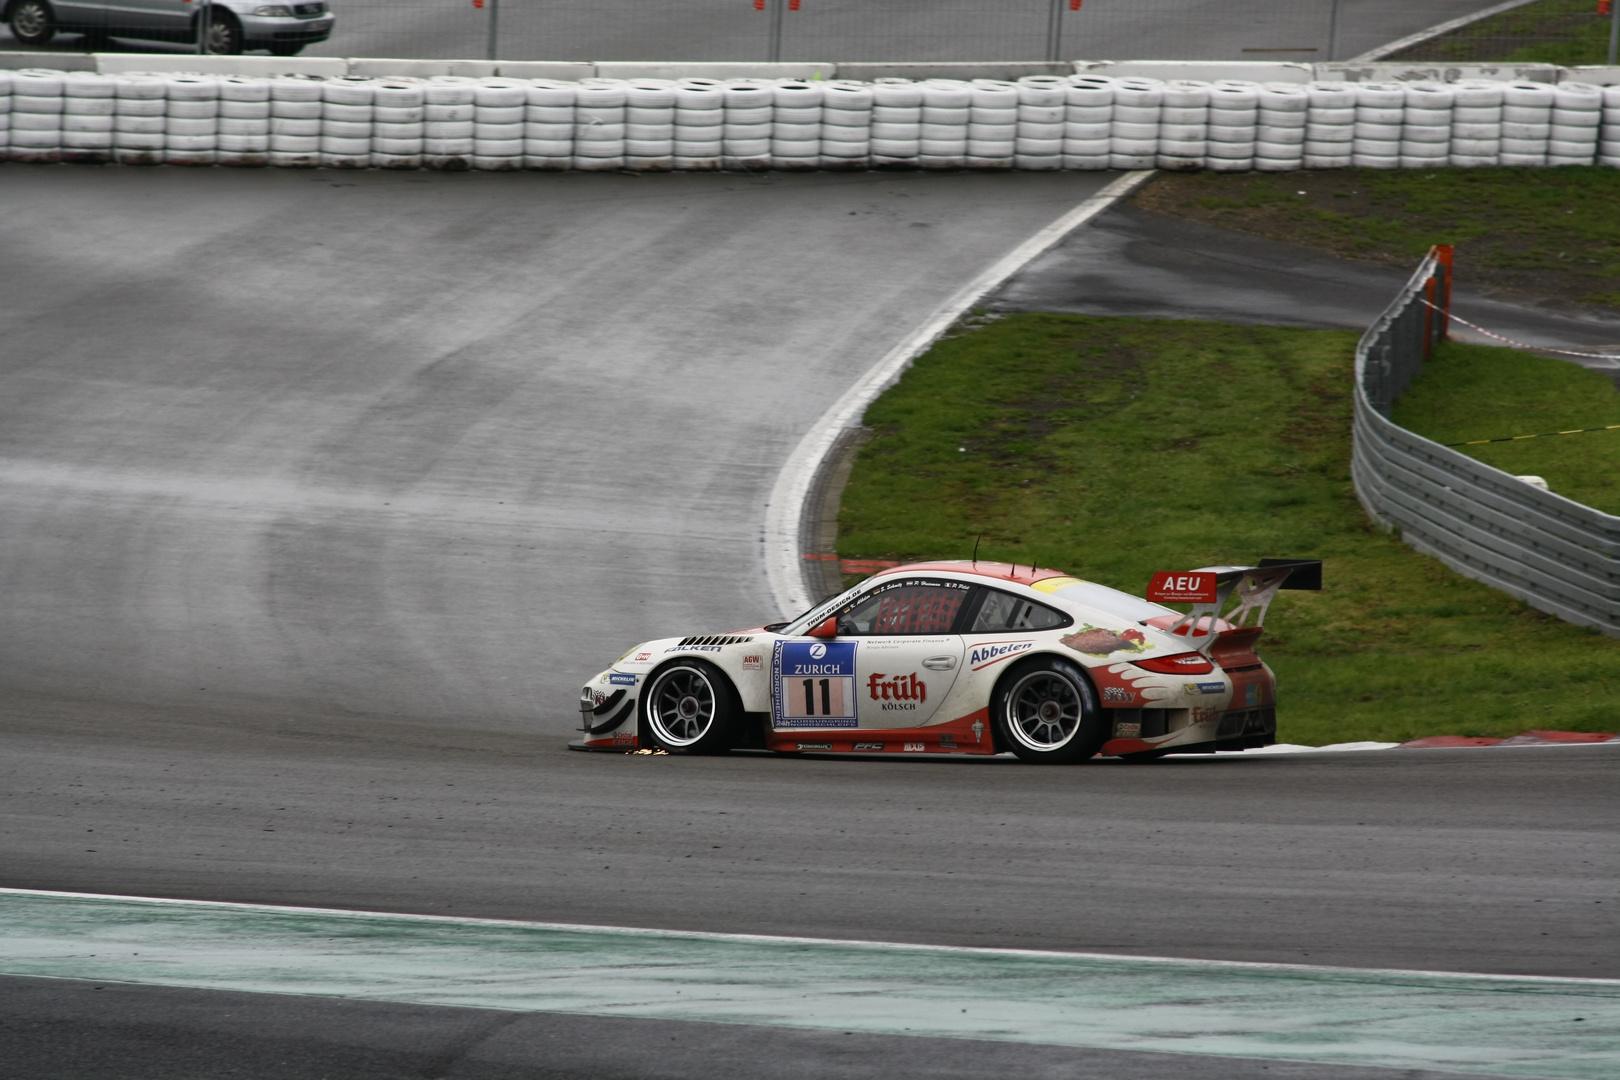 #11 Frikadlli-Racing